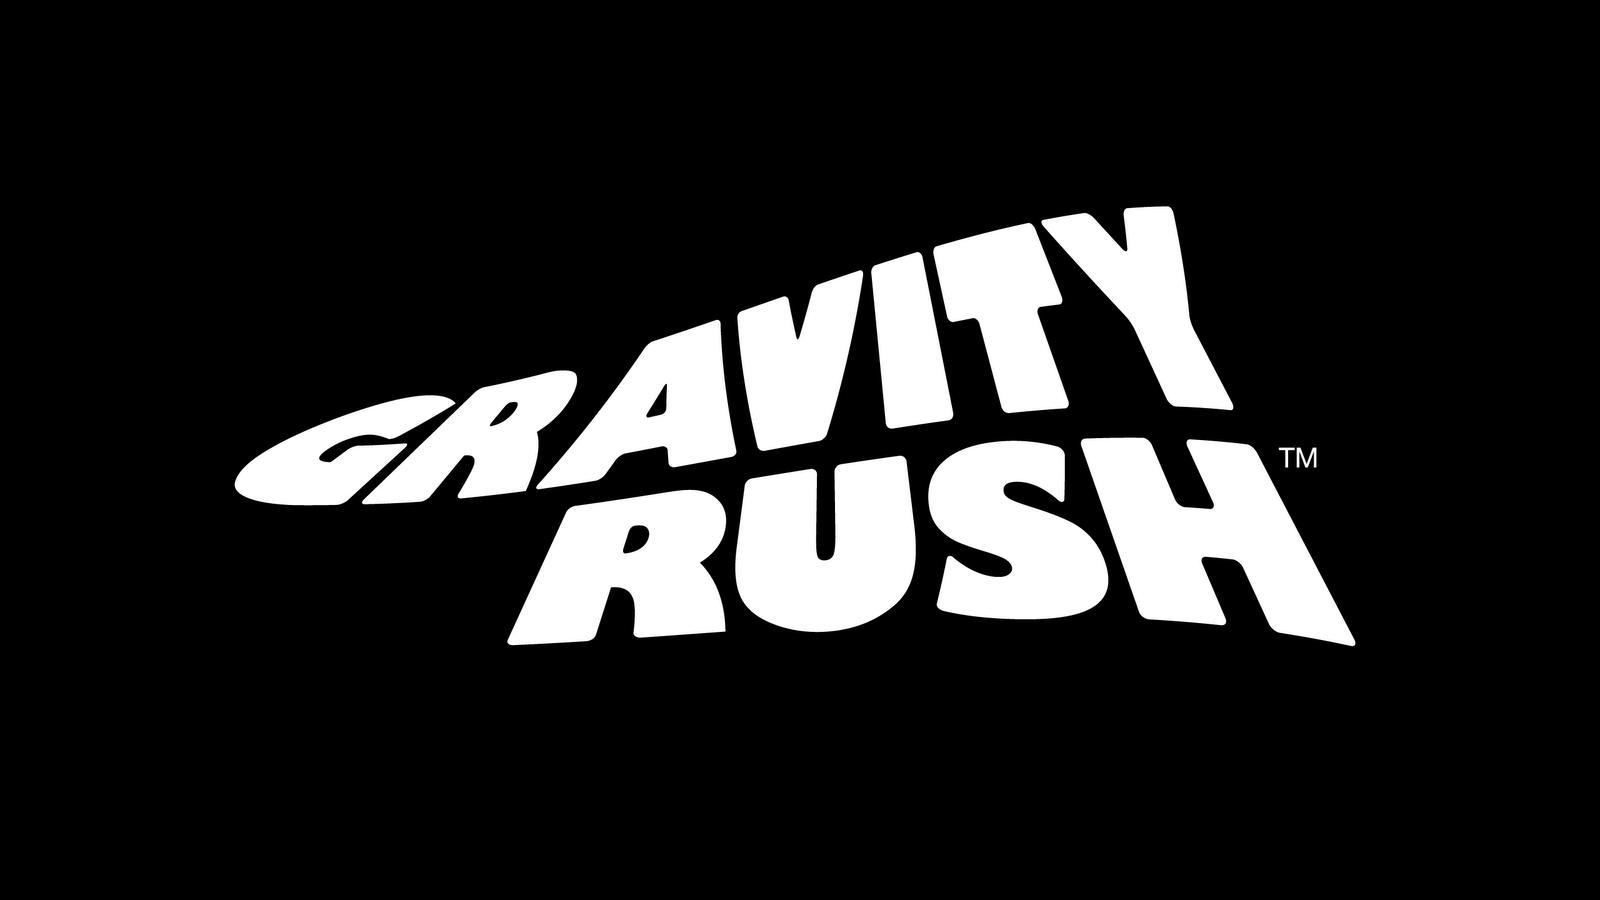 Gravity rush.png - Gravity Rush PNG